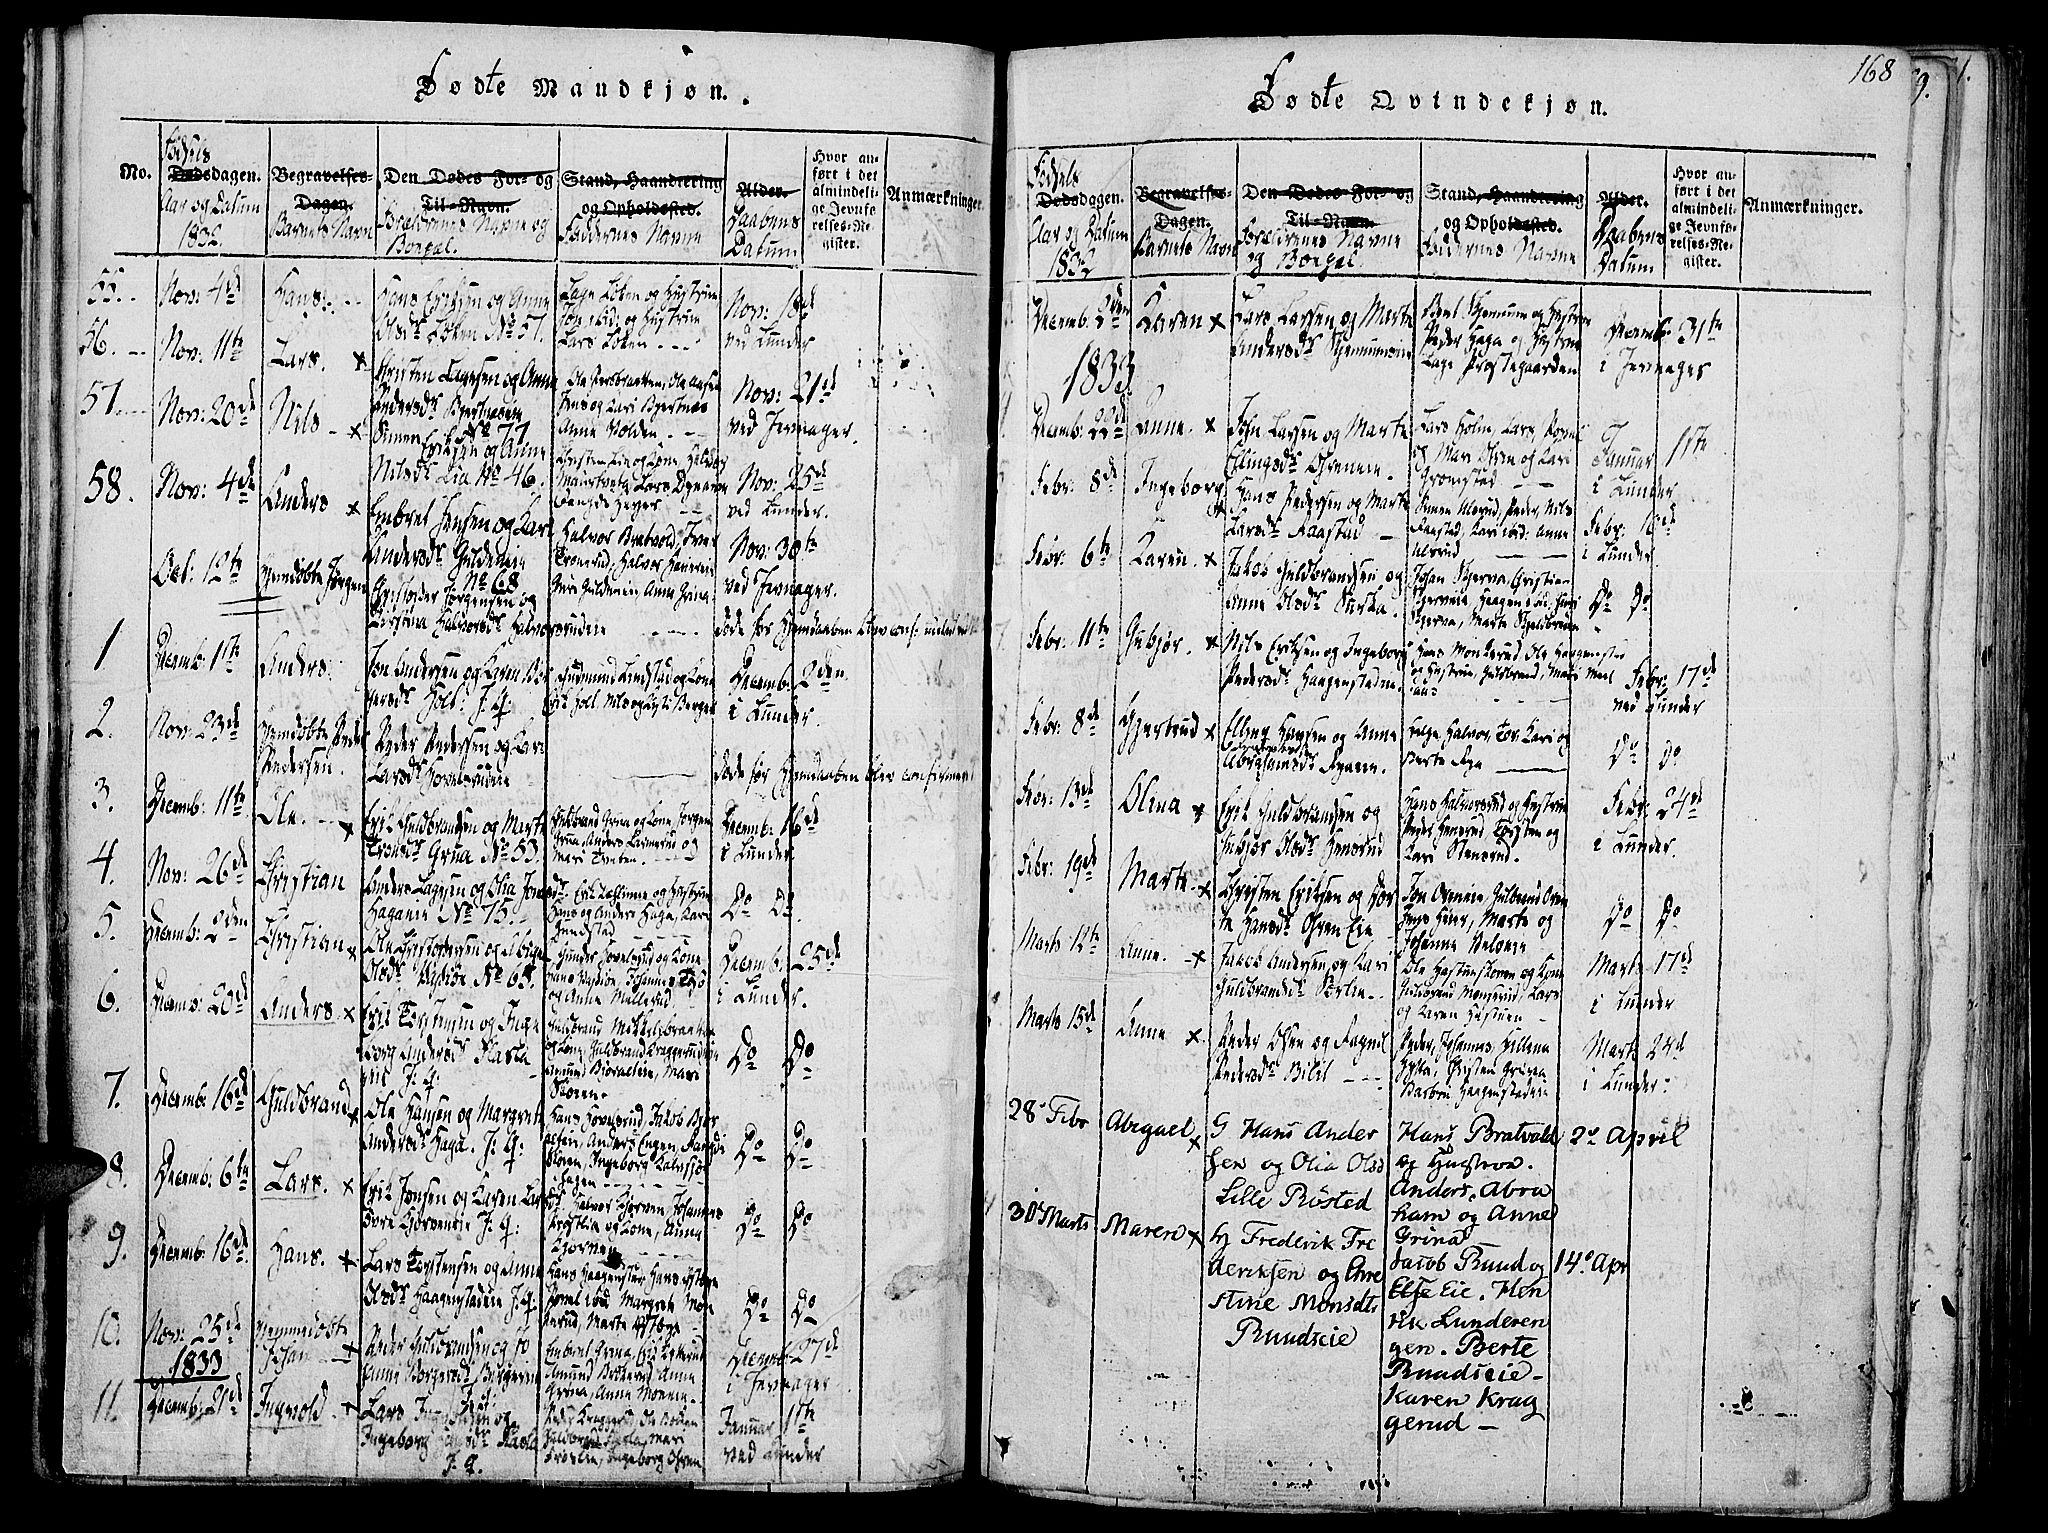 SAH, Jevnaker prestekontor, Ministerialbok nr. 5, 1815-1837, s. 168